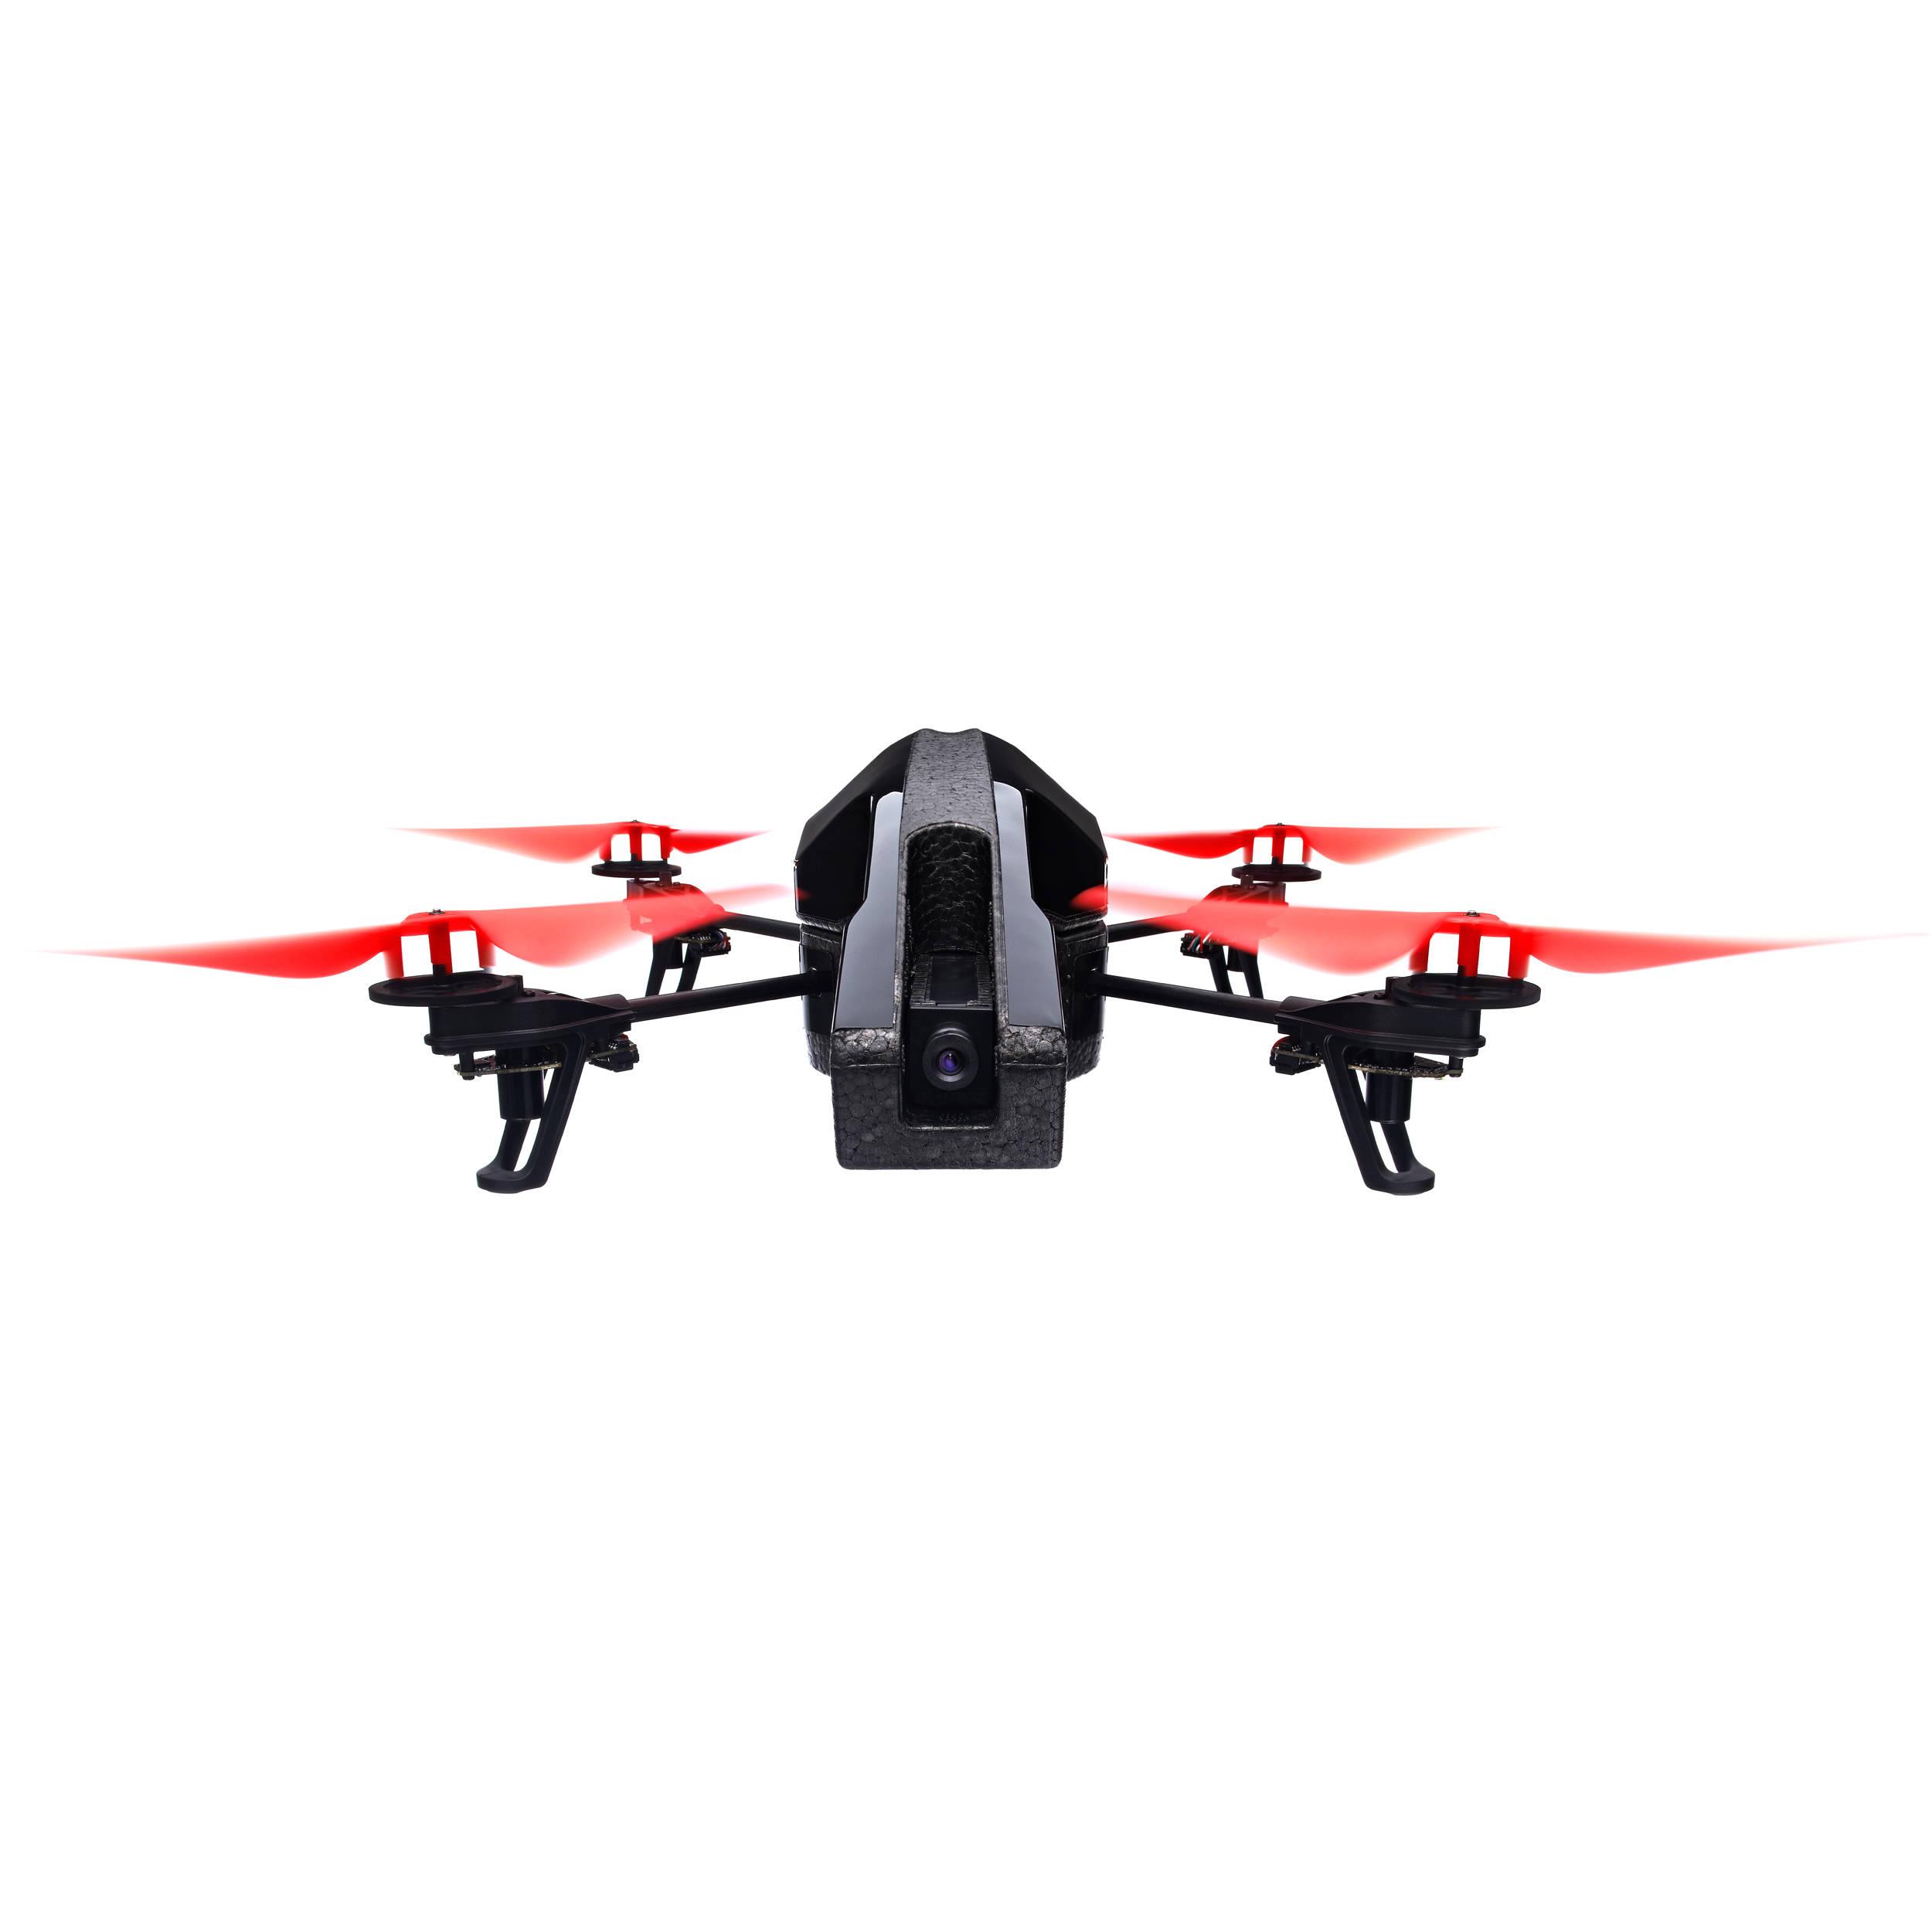 parrot ar drone 2.0 power edition app